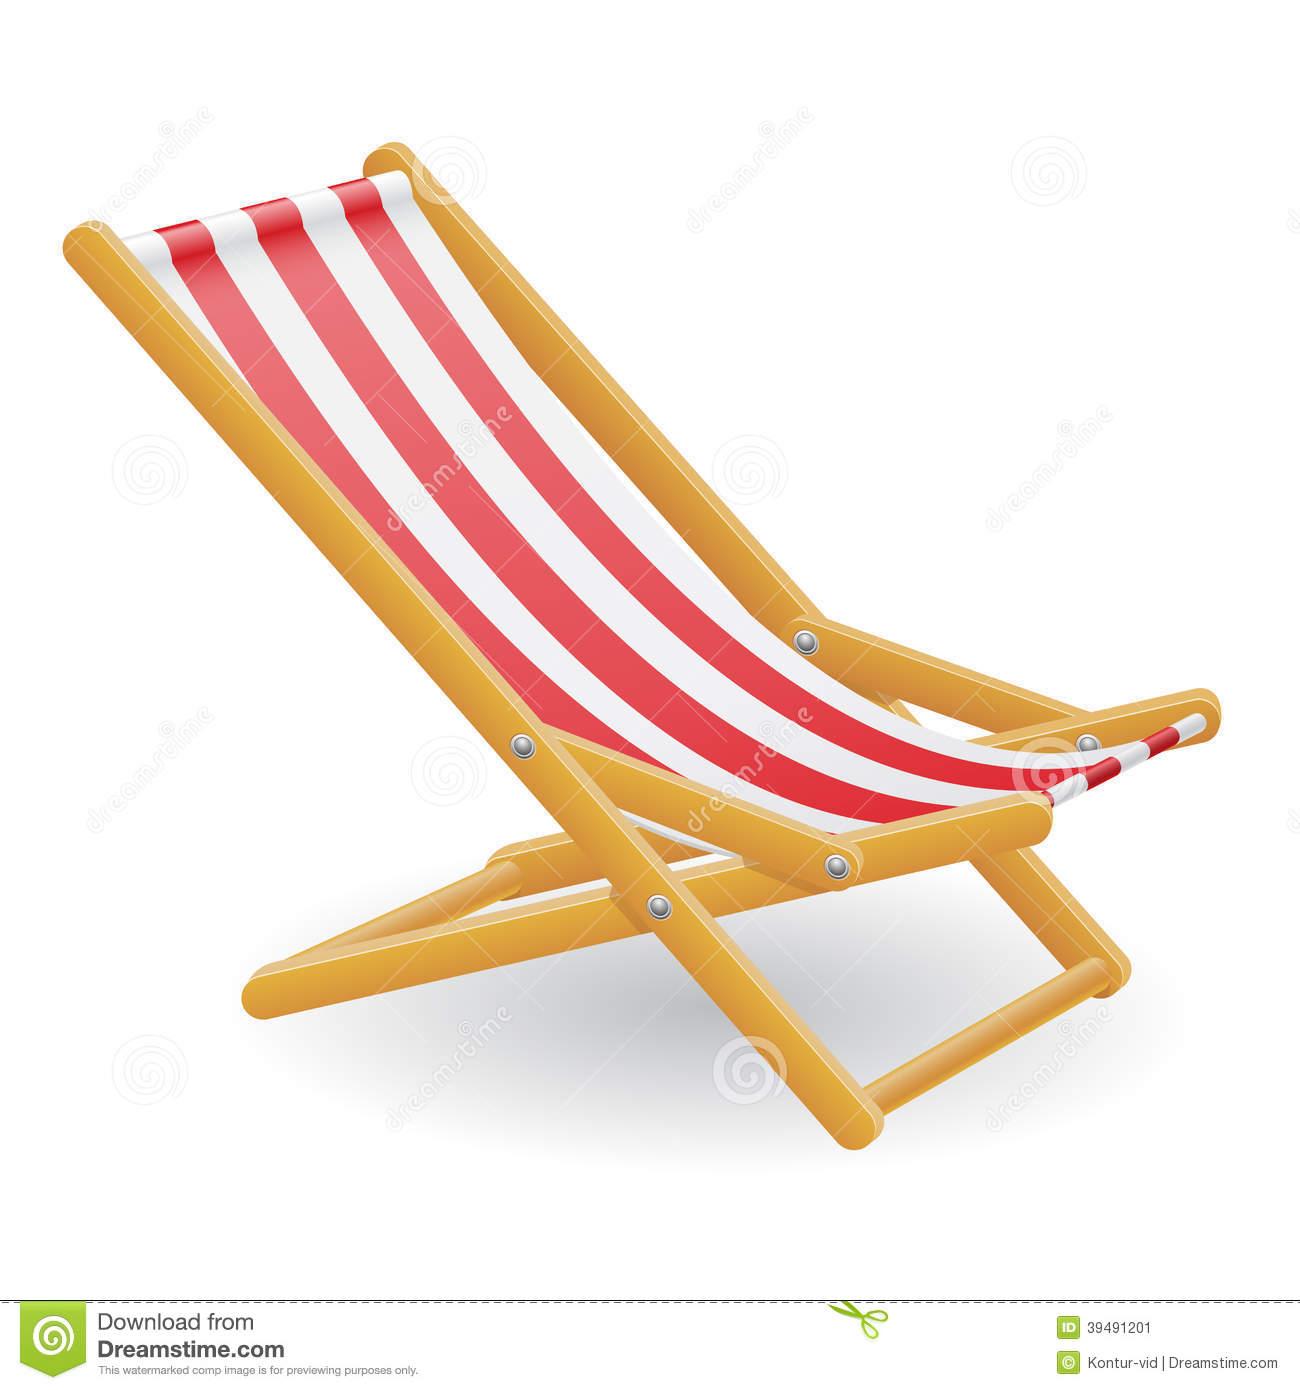 10 Beach Umbrella Vector Images - Beach Umbrella, Beach ...